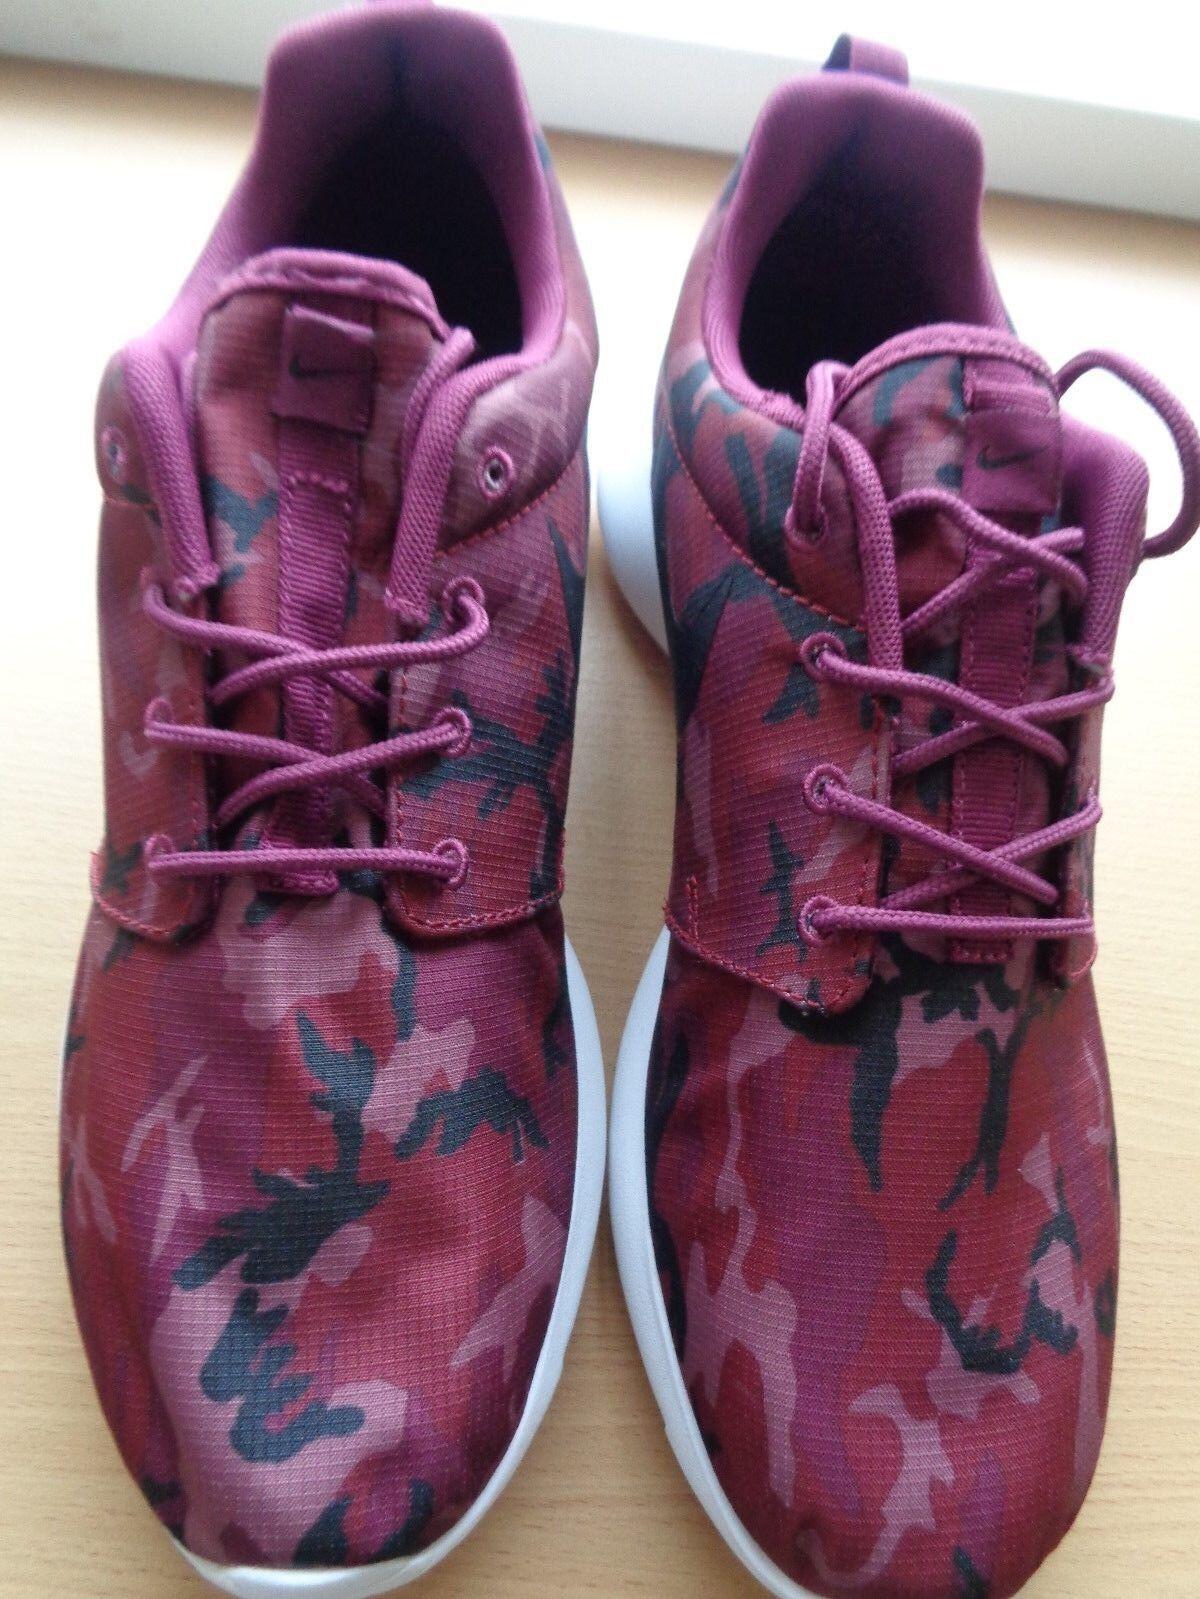 Nike Roshecourir print homme  trainers Baskets 655206 660 uk 9 7 eu 41 us 9 uk NEWBOX e74b59